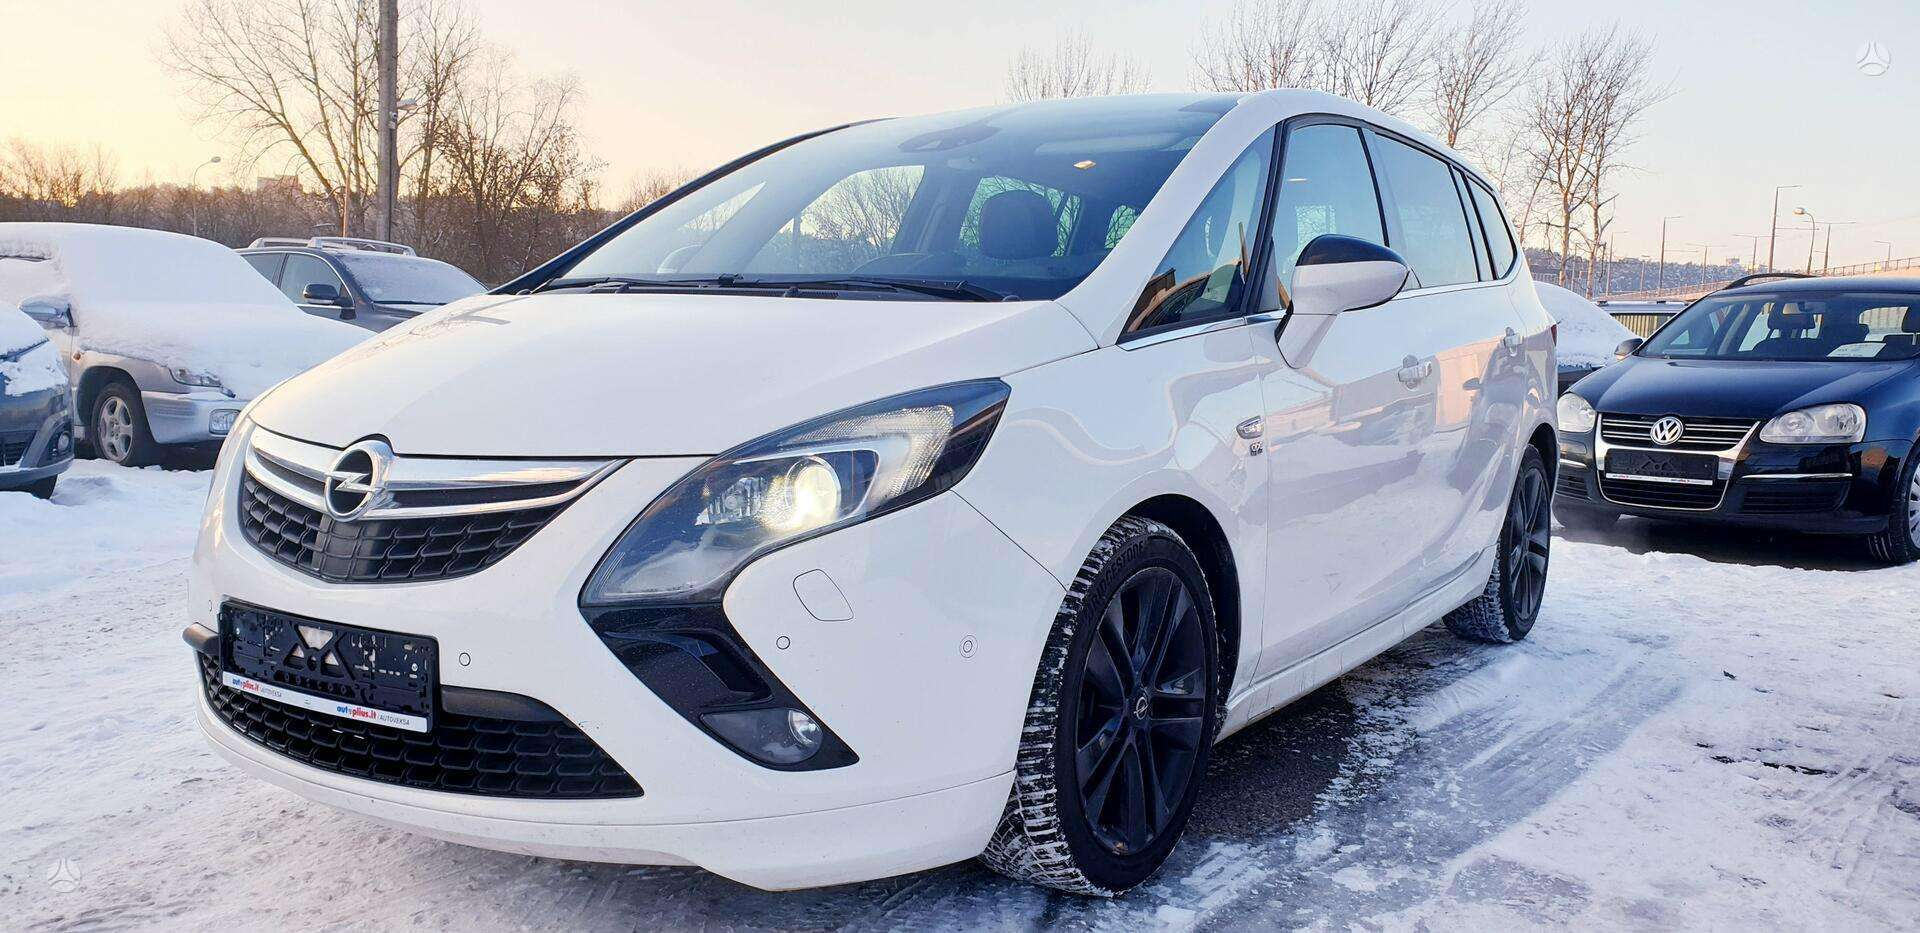 Opel Zafira C ✅ 2015 m. ✅1.6 Ecotec 100kw Dyzelinas ✅